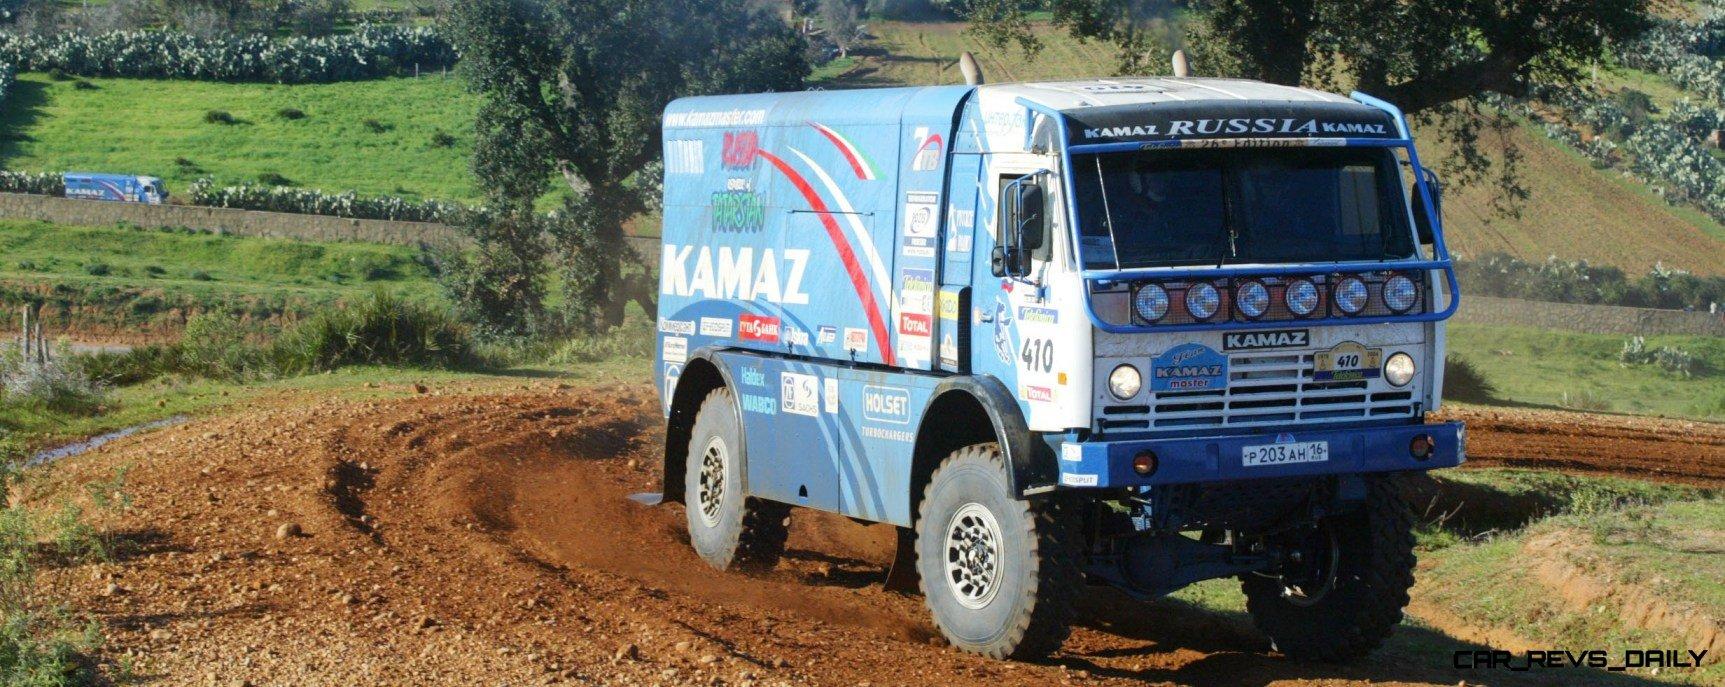 Unimog Nemesis - Red Bull KAMAZ 4911 - Dakar T4 Hero  47